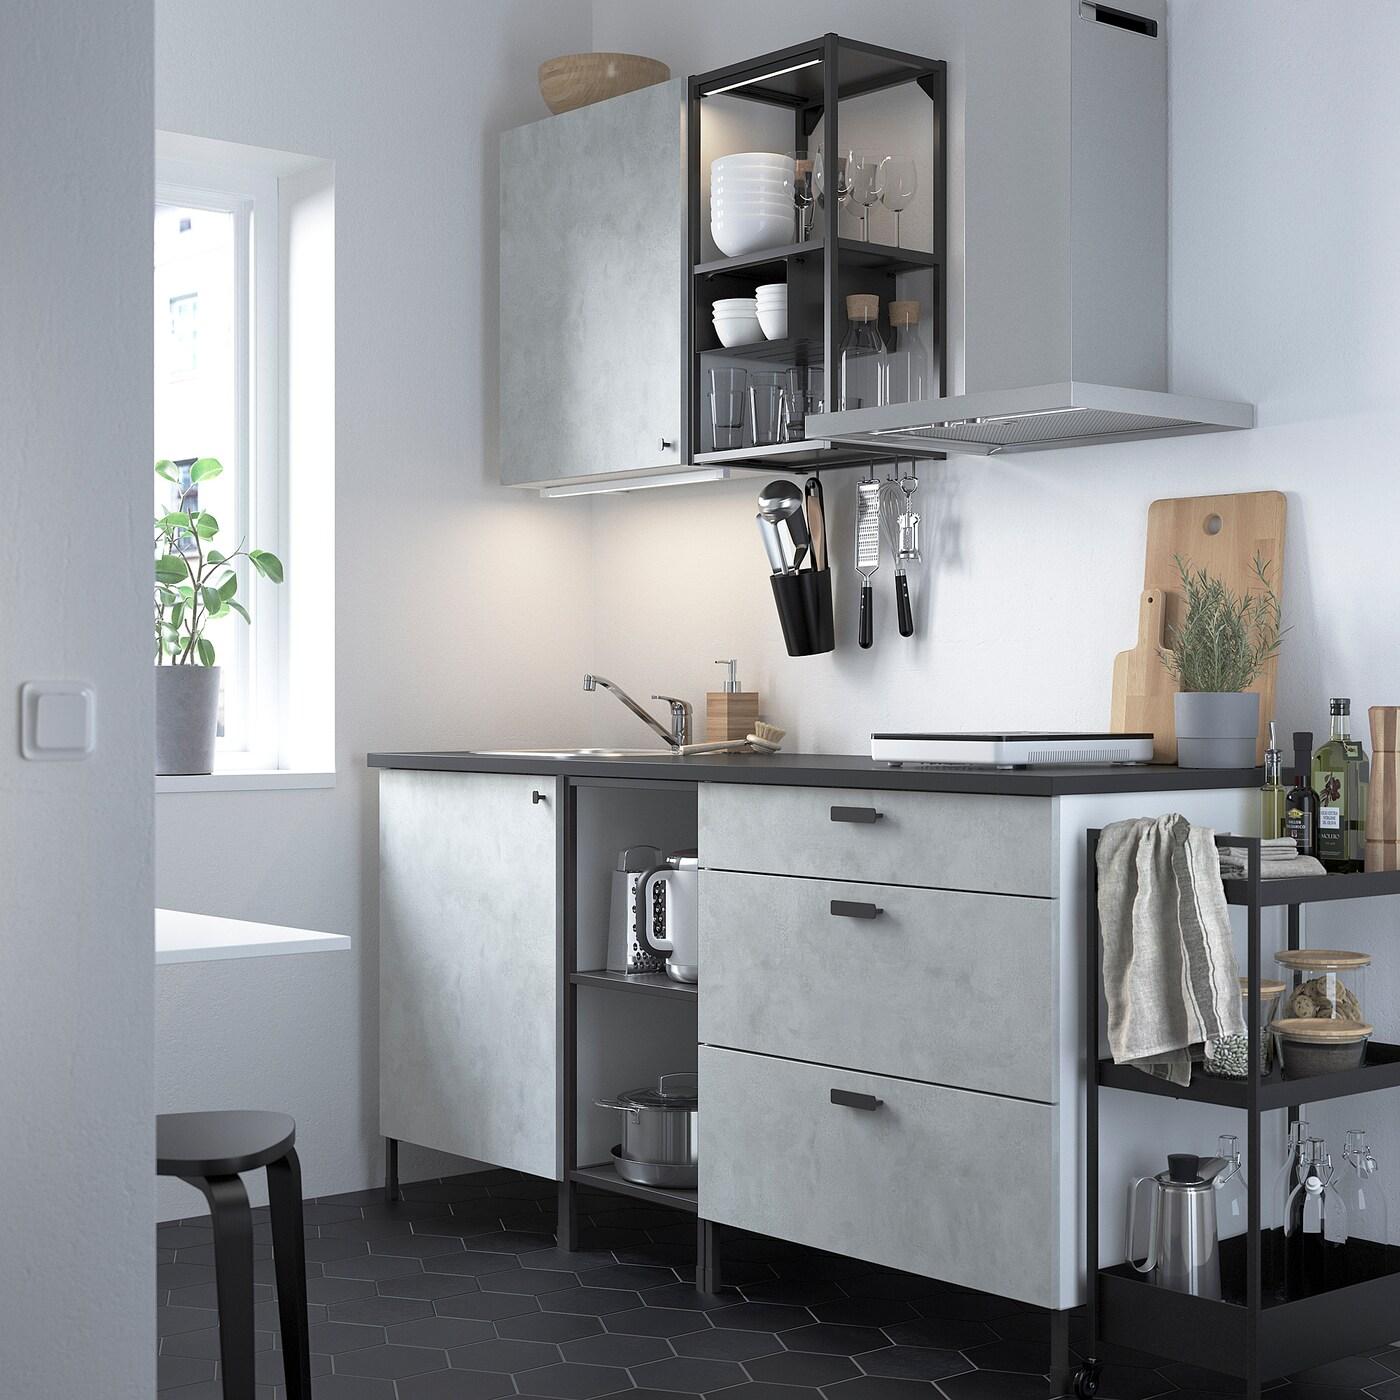 ENHET Kuchyně, antracit/imitace betonu, 183x63.5x222 cm